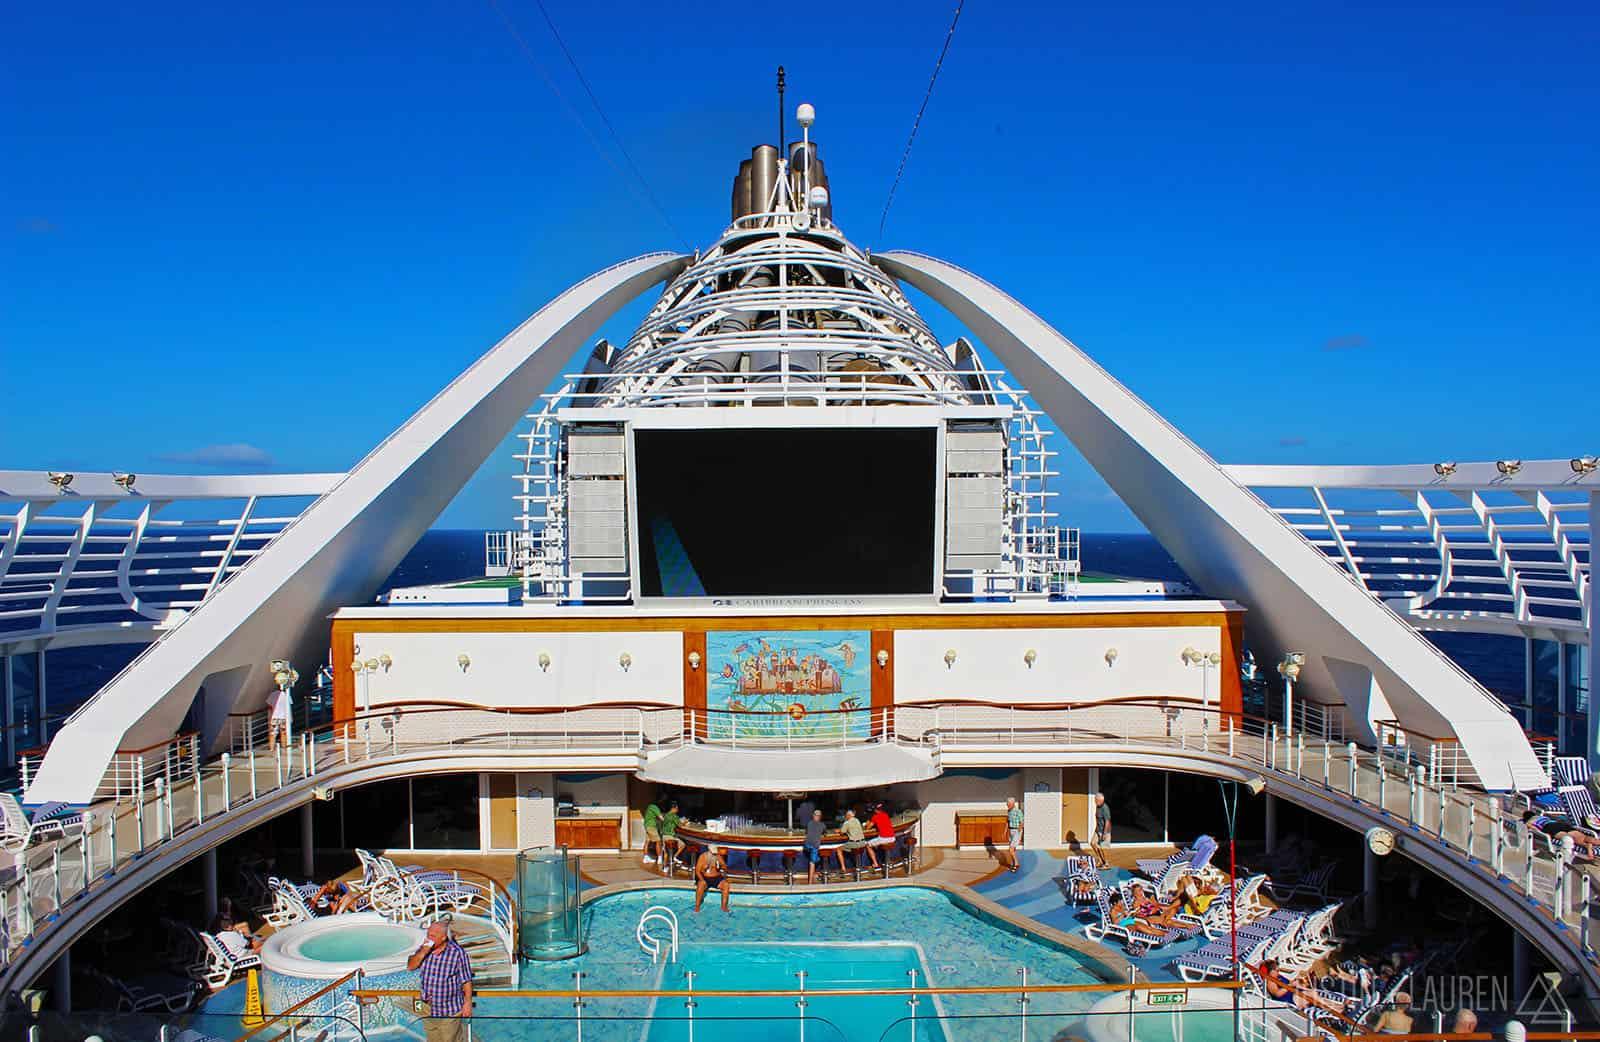 Caribbean Princess Cruise Ship Tour in Photos and Video